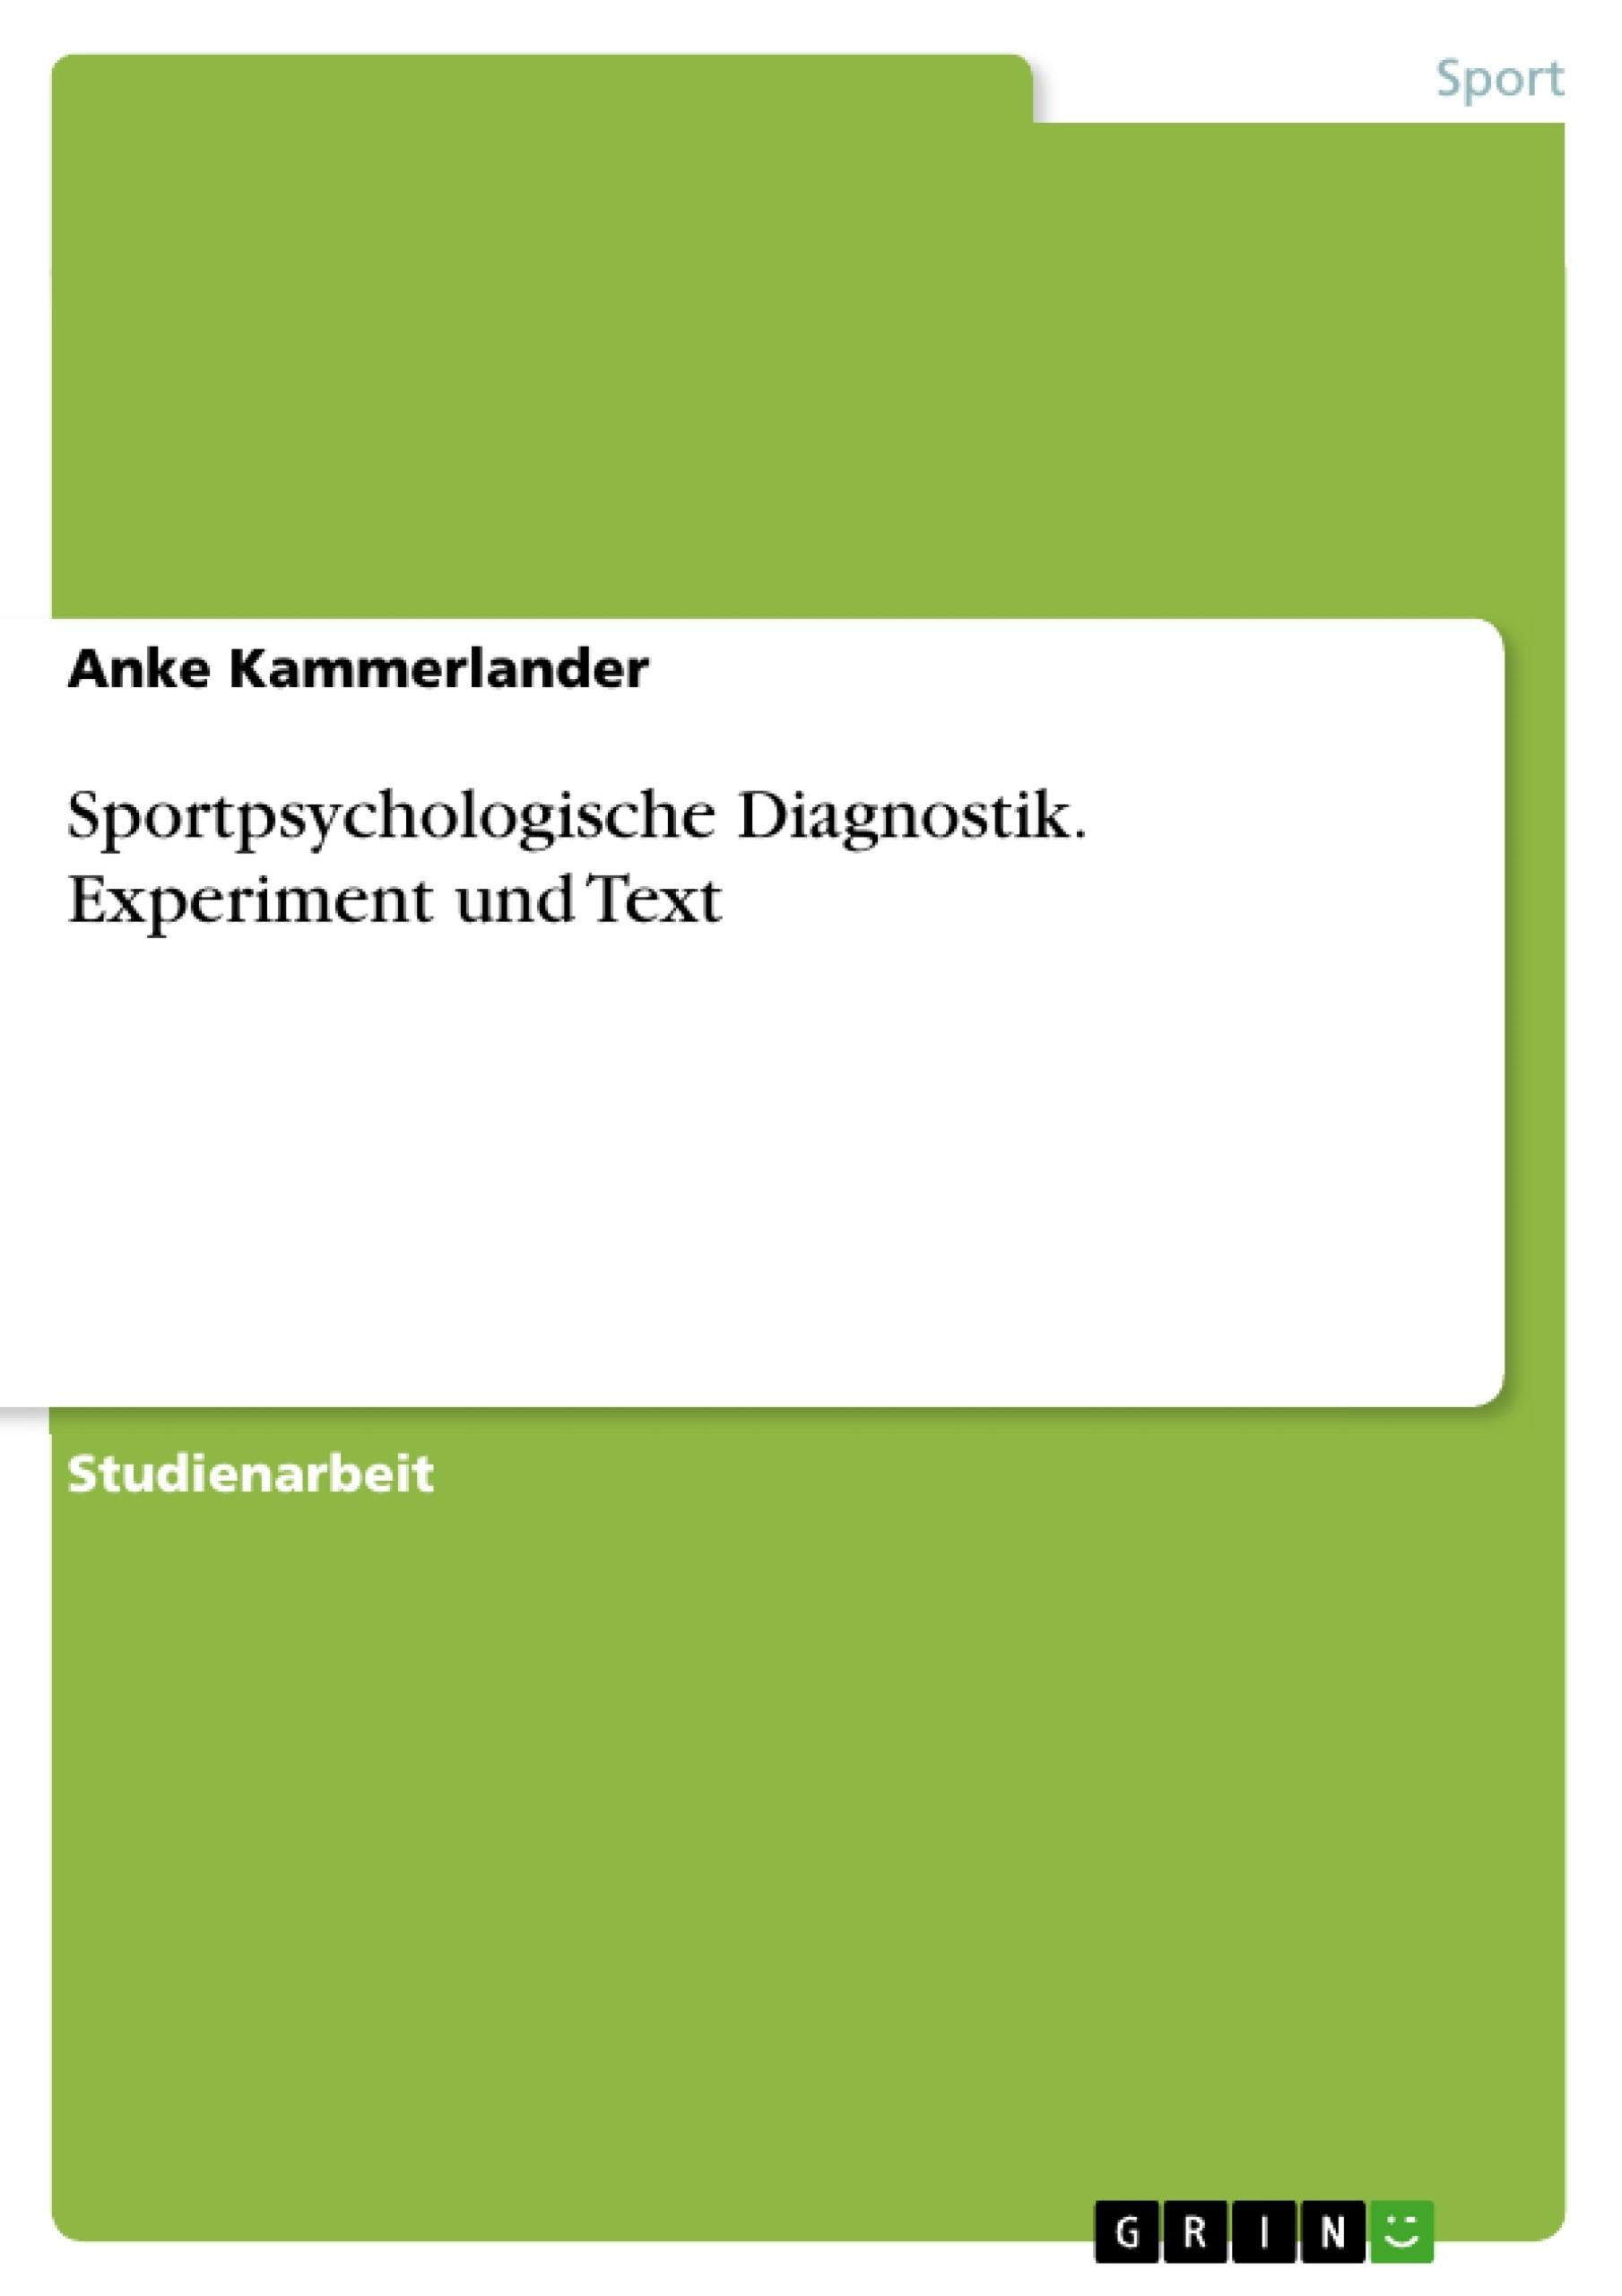 Titel: Sportpsychologische Diagnostik. Experiment und Text